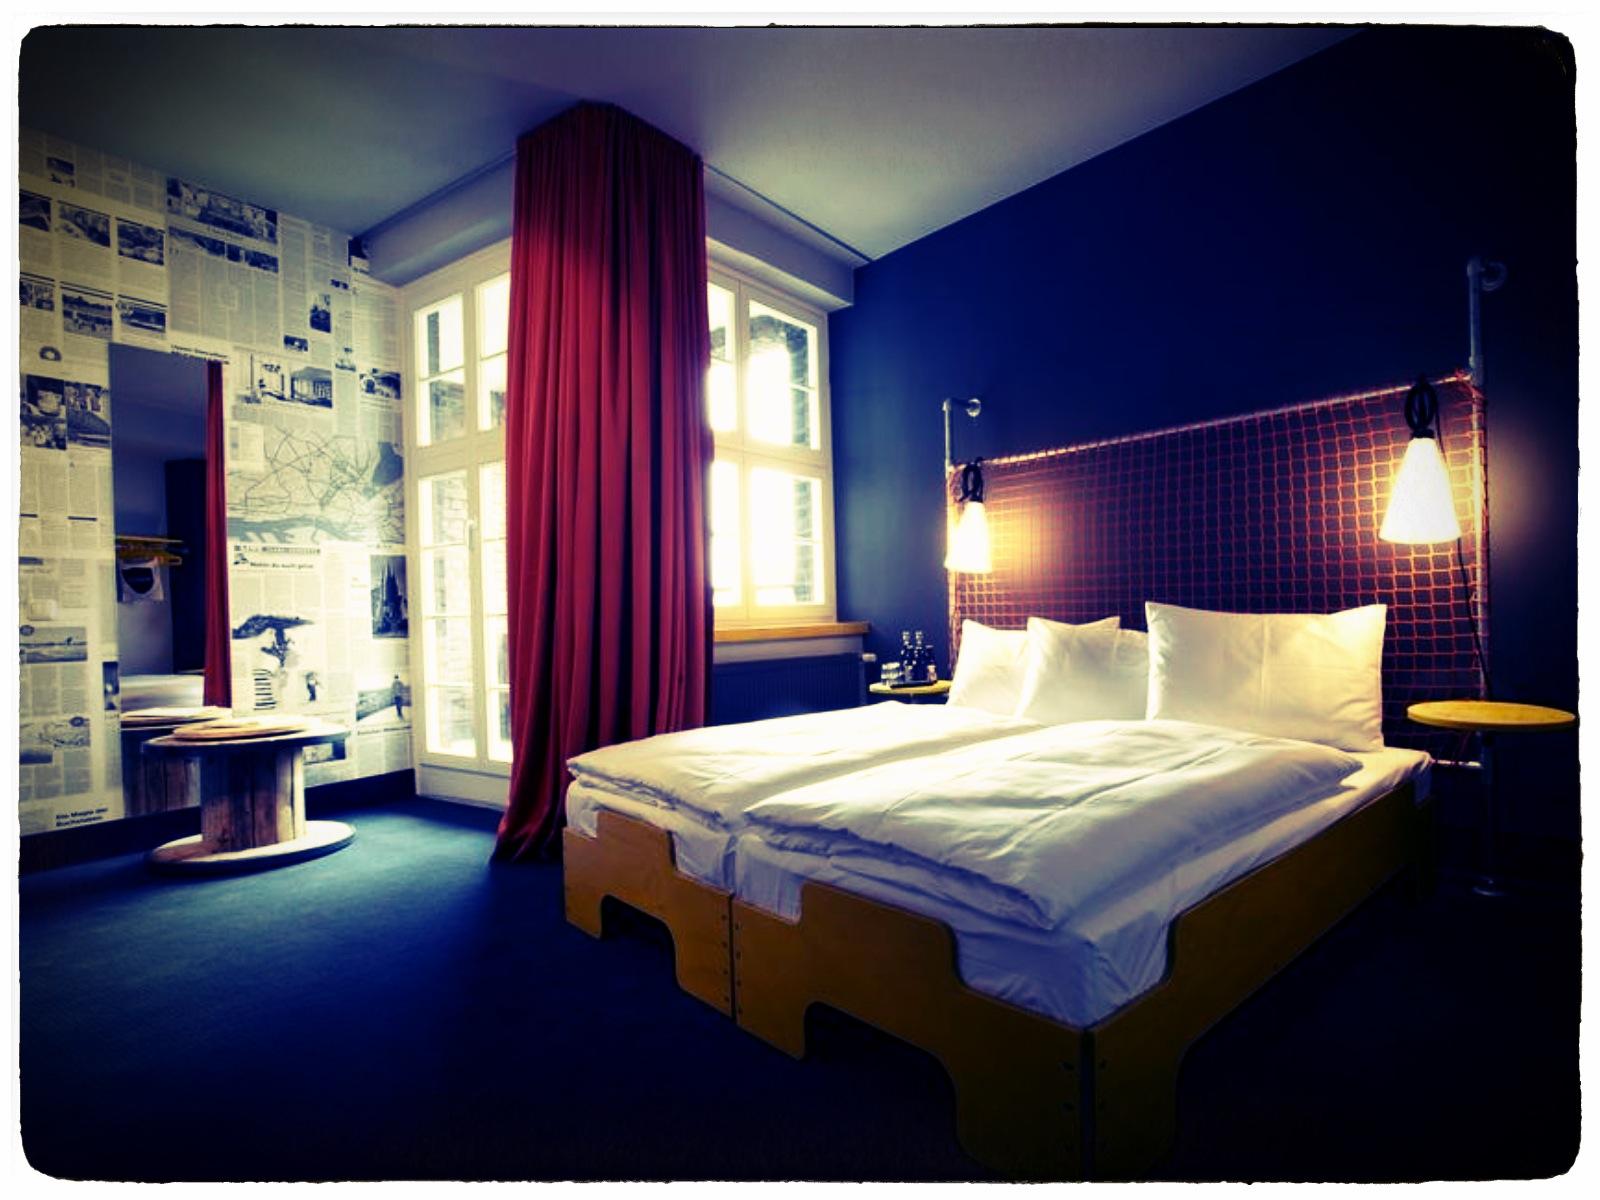 Superbude Hotel Hostel St.Pauli